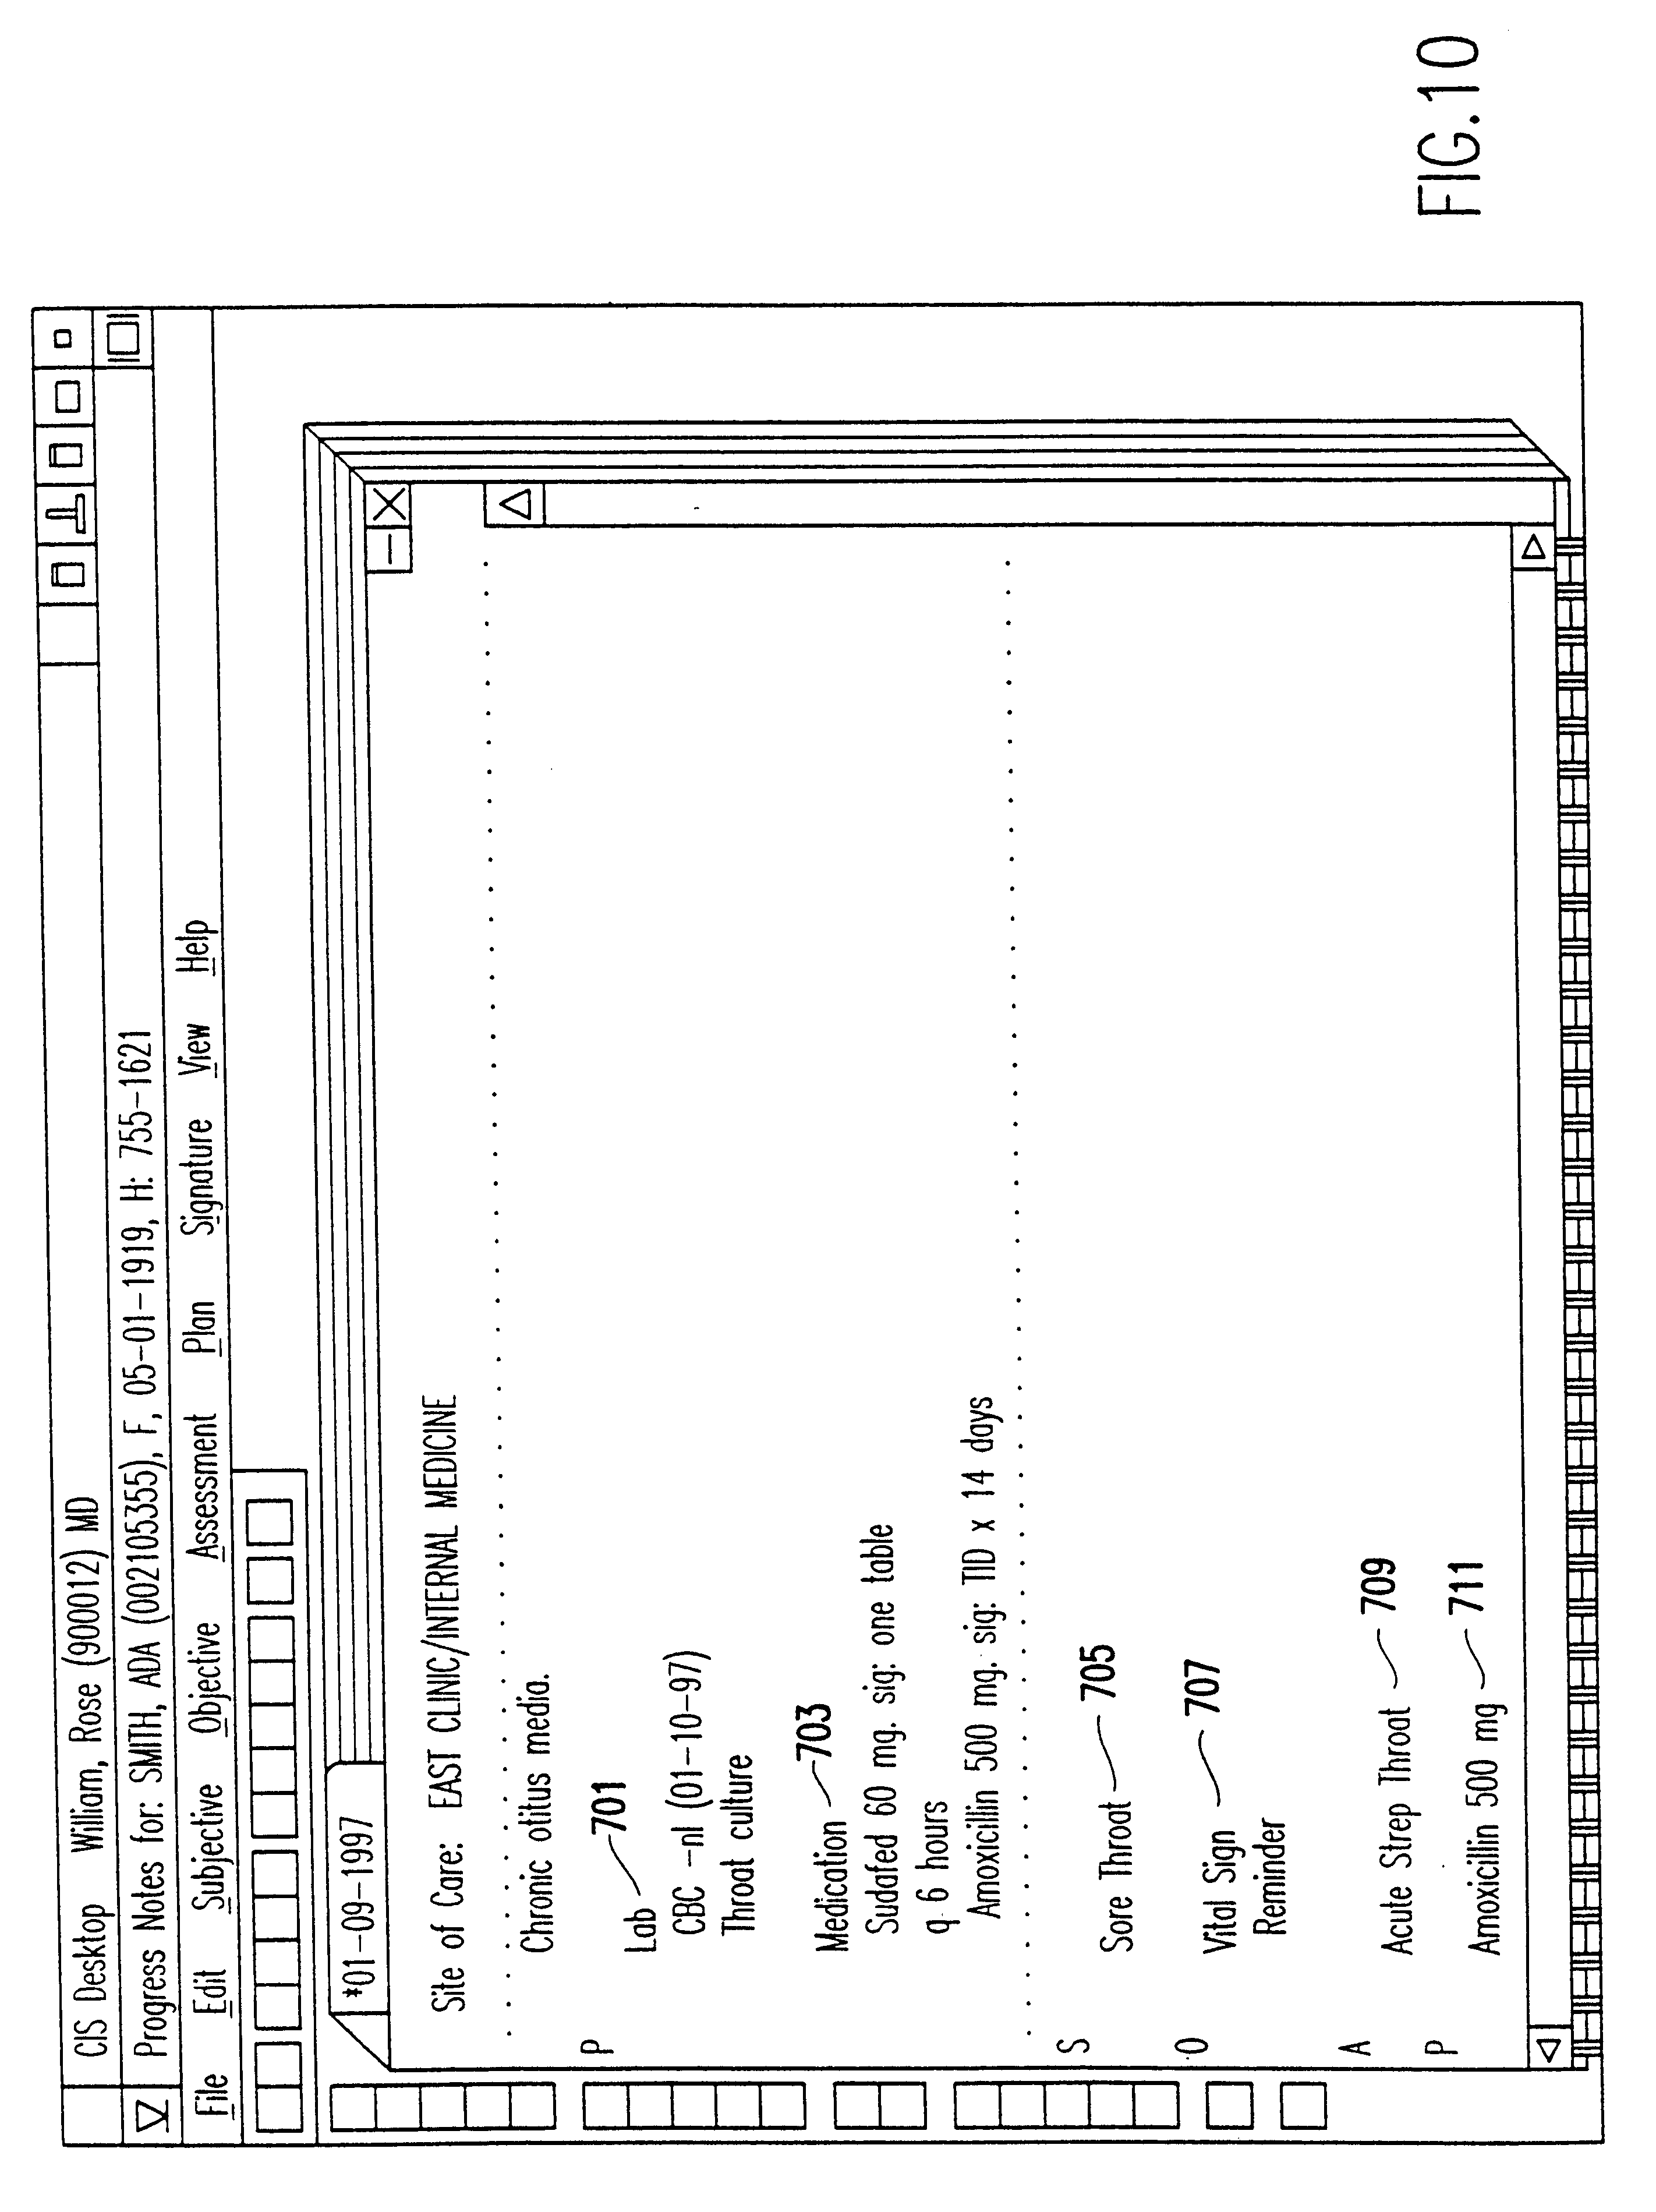 Index of /class/cs145